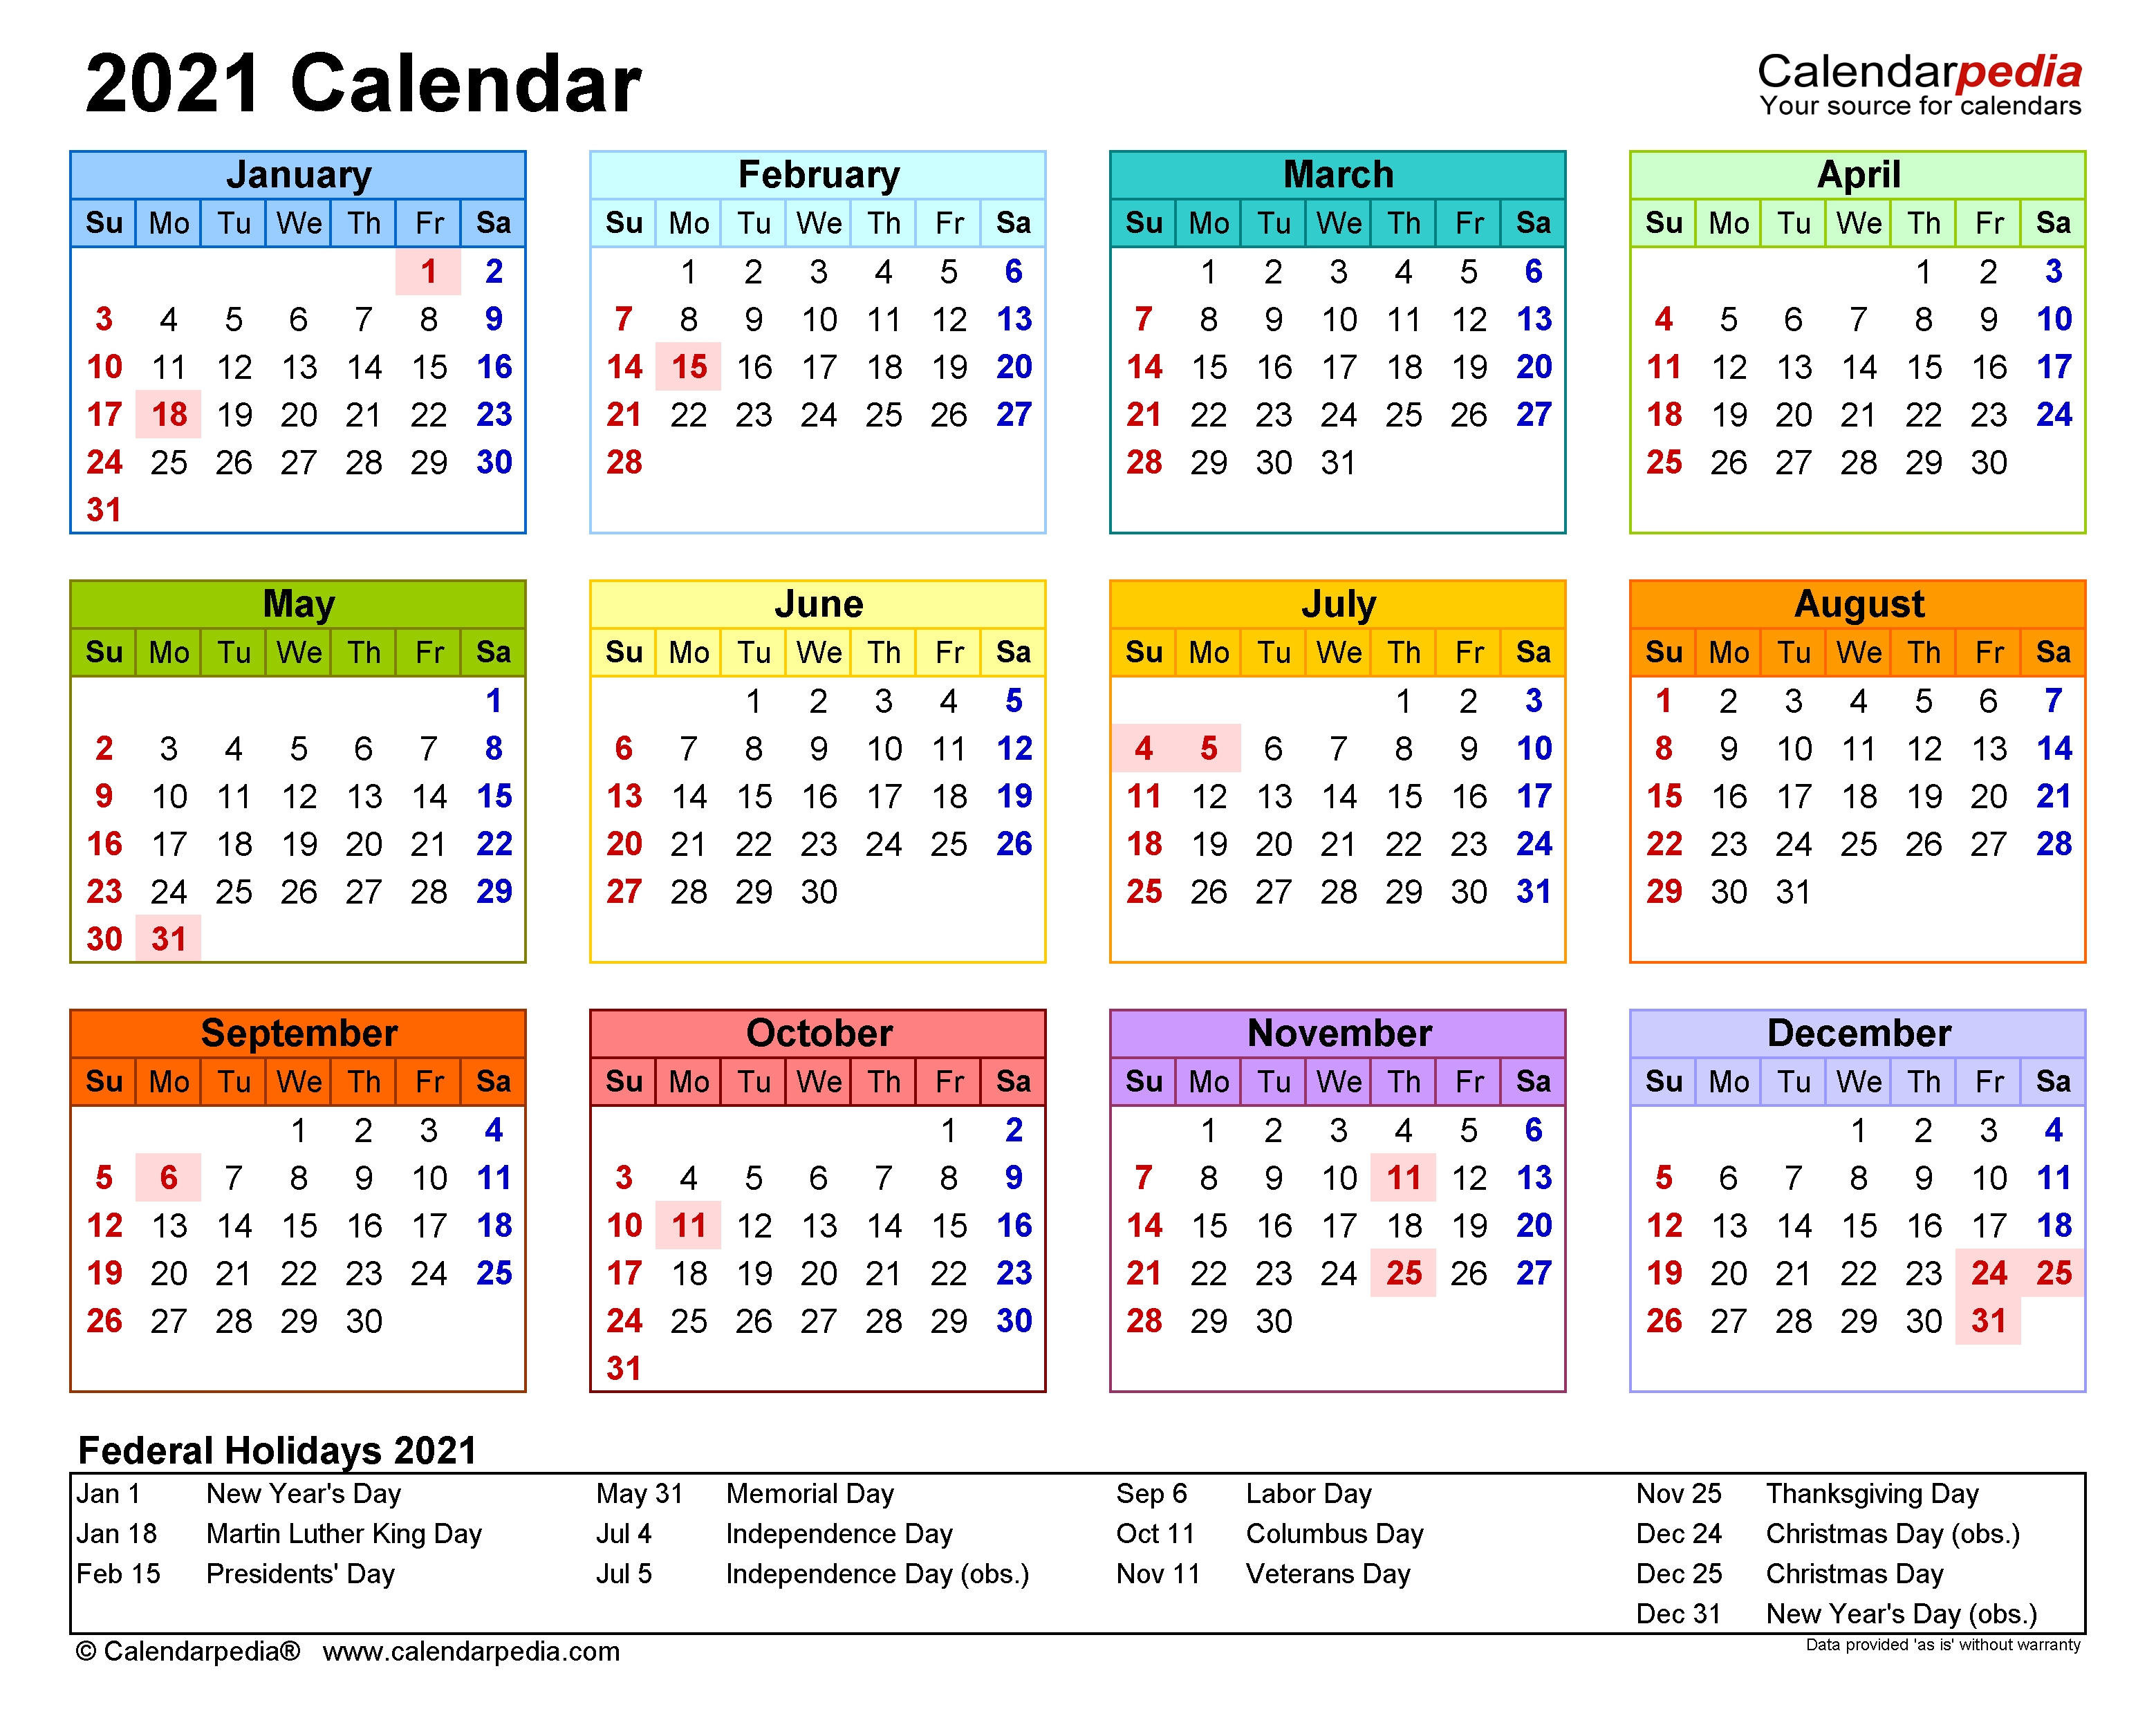 2021 Calendar - Free Printable Excel Templates - Calendarpedia 2021 Myanmar Calendar Microsoft Office